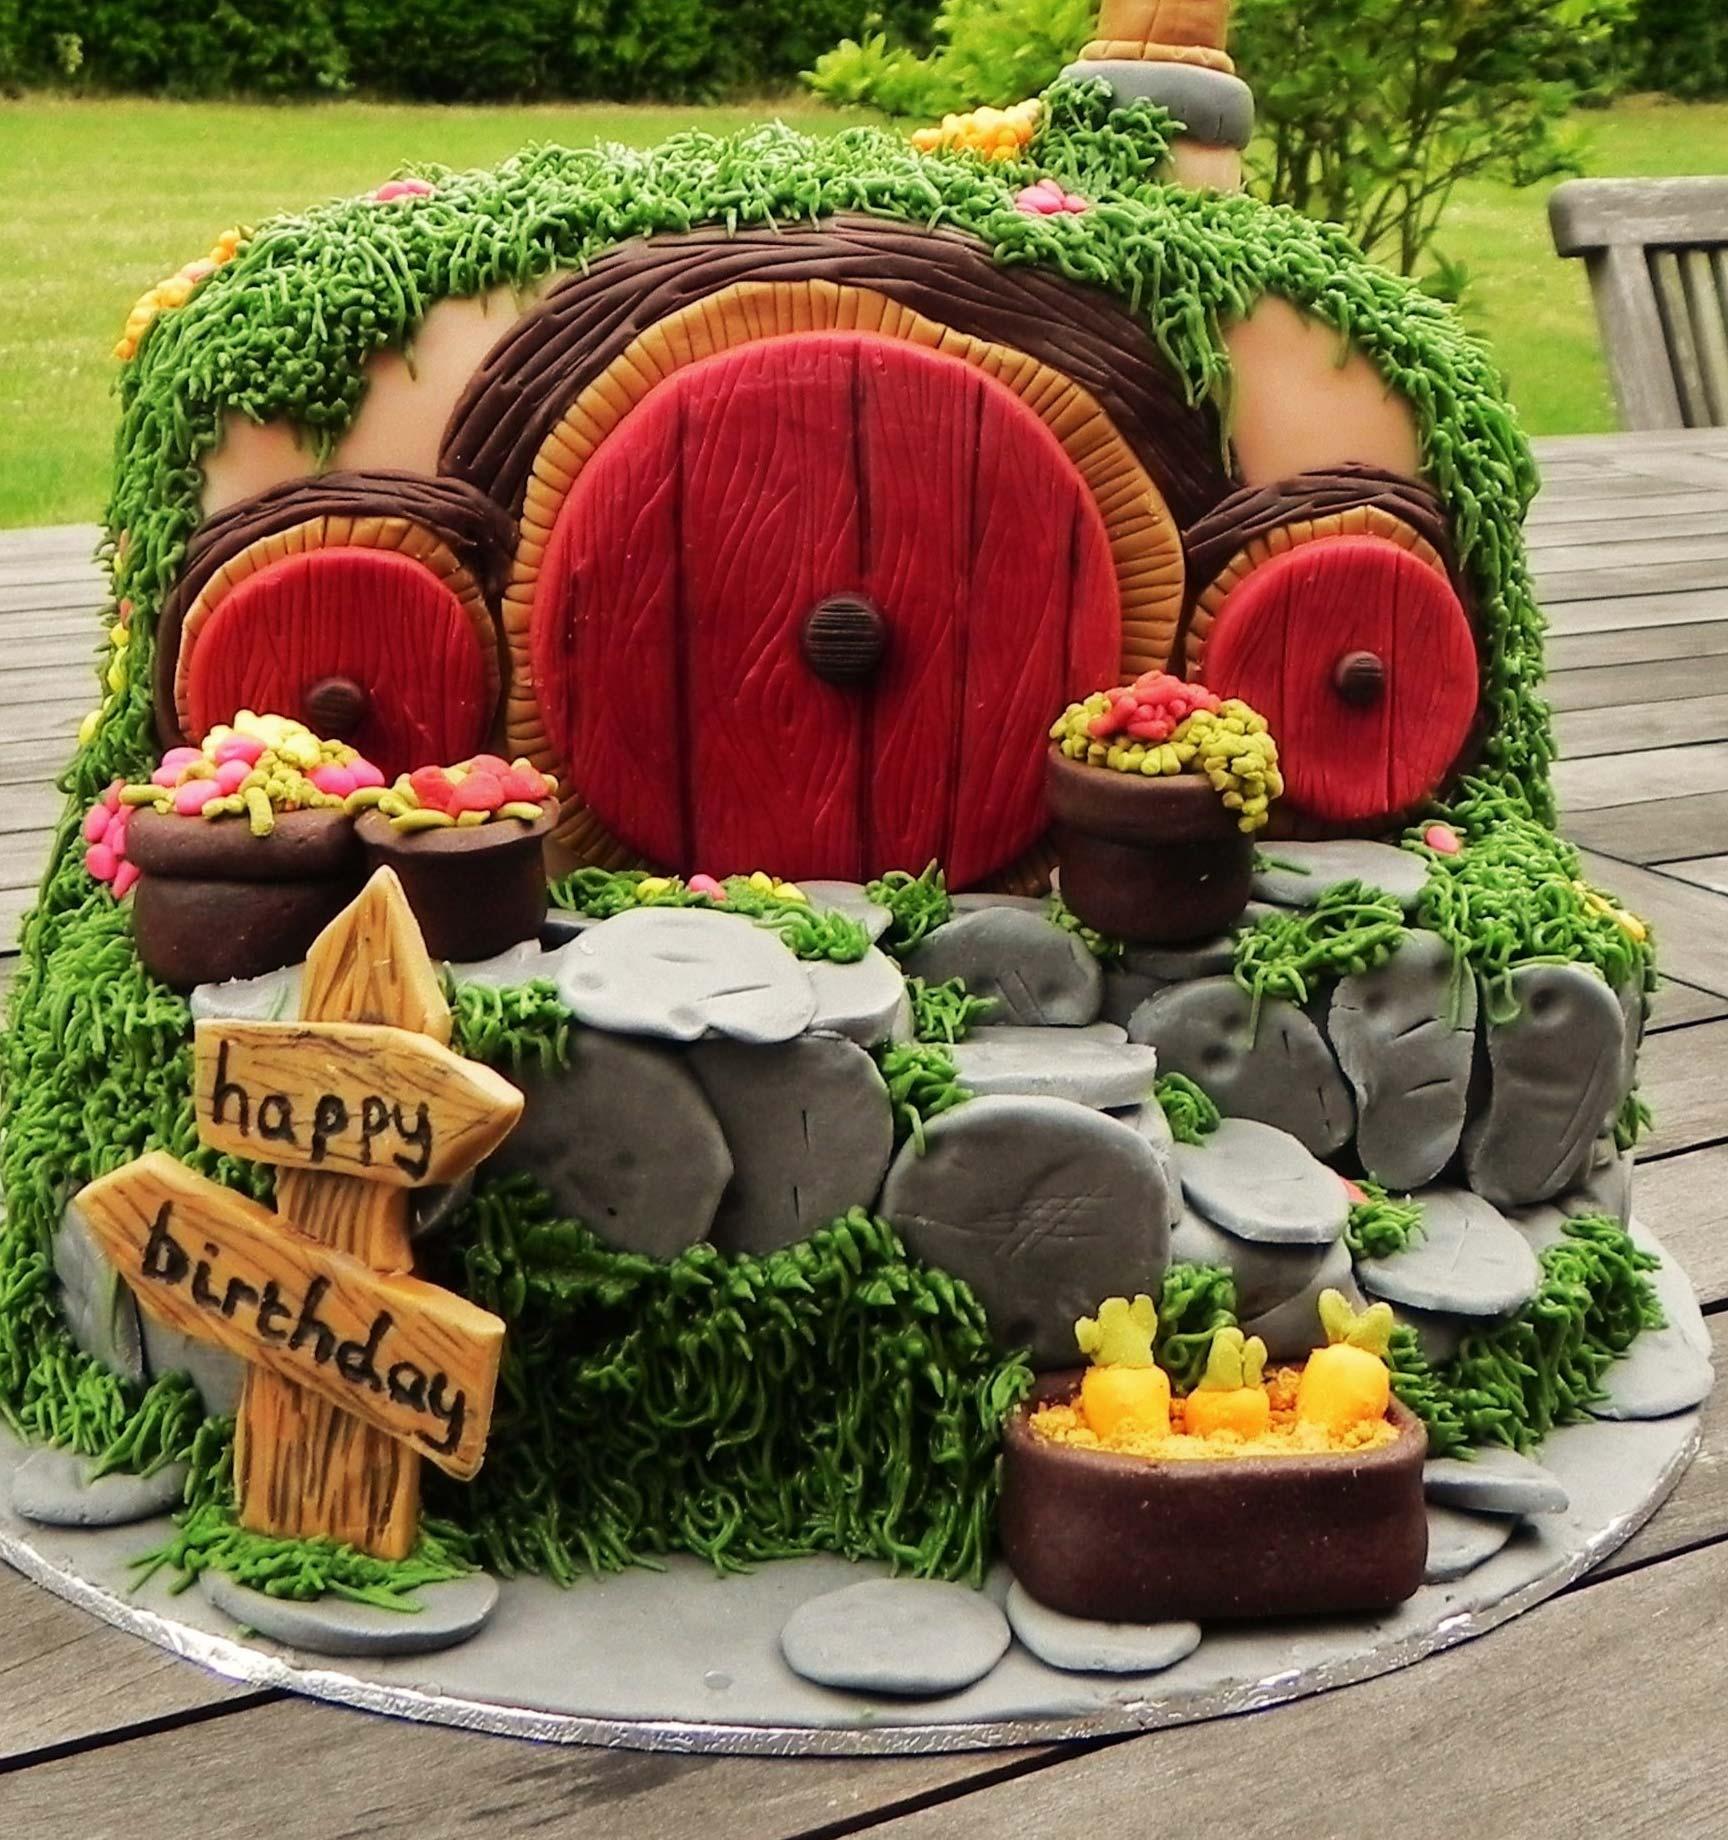 garden-themed-cake-latest-cake-images-ideas